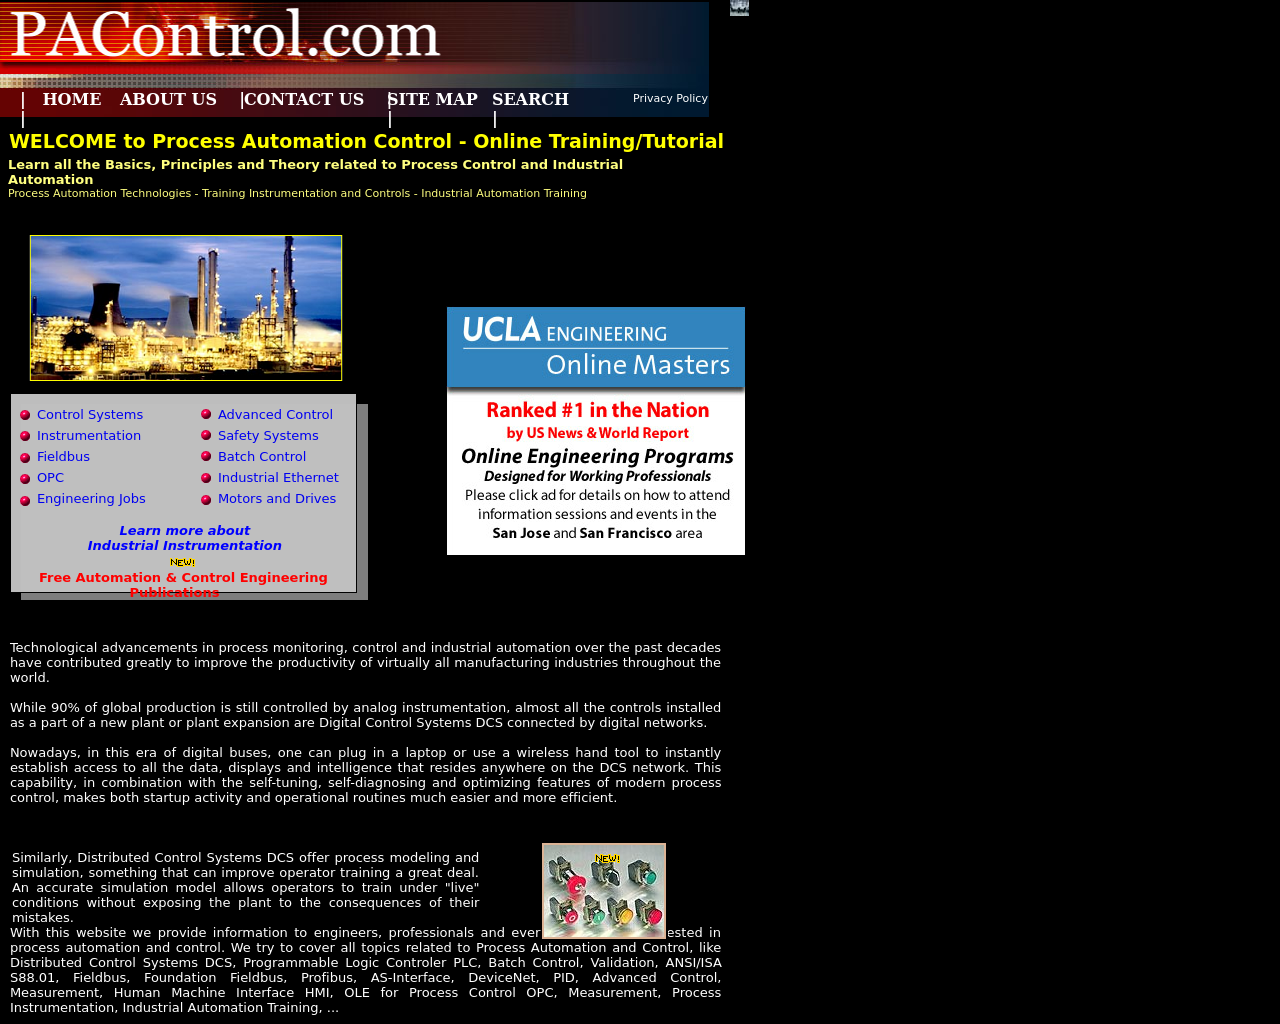 PAControl.com-Advertising-Reviews-Pricing